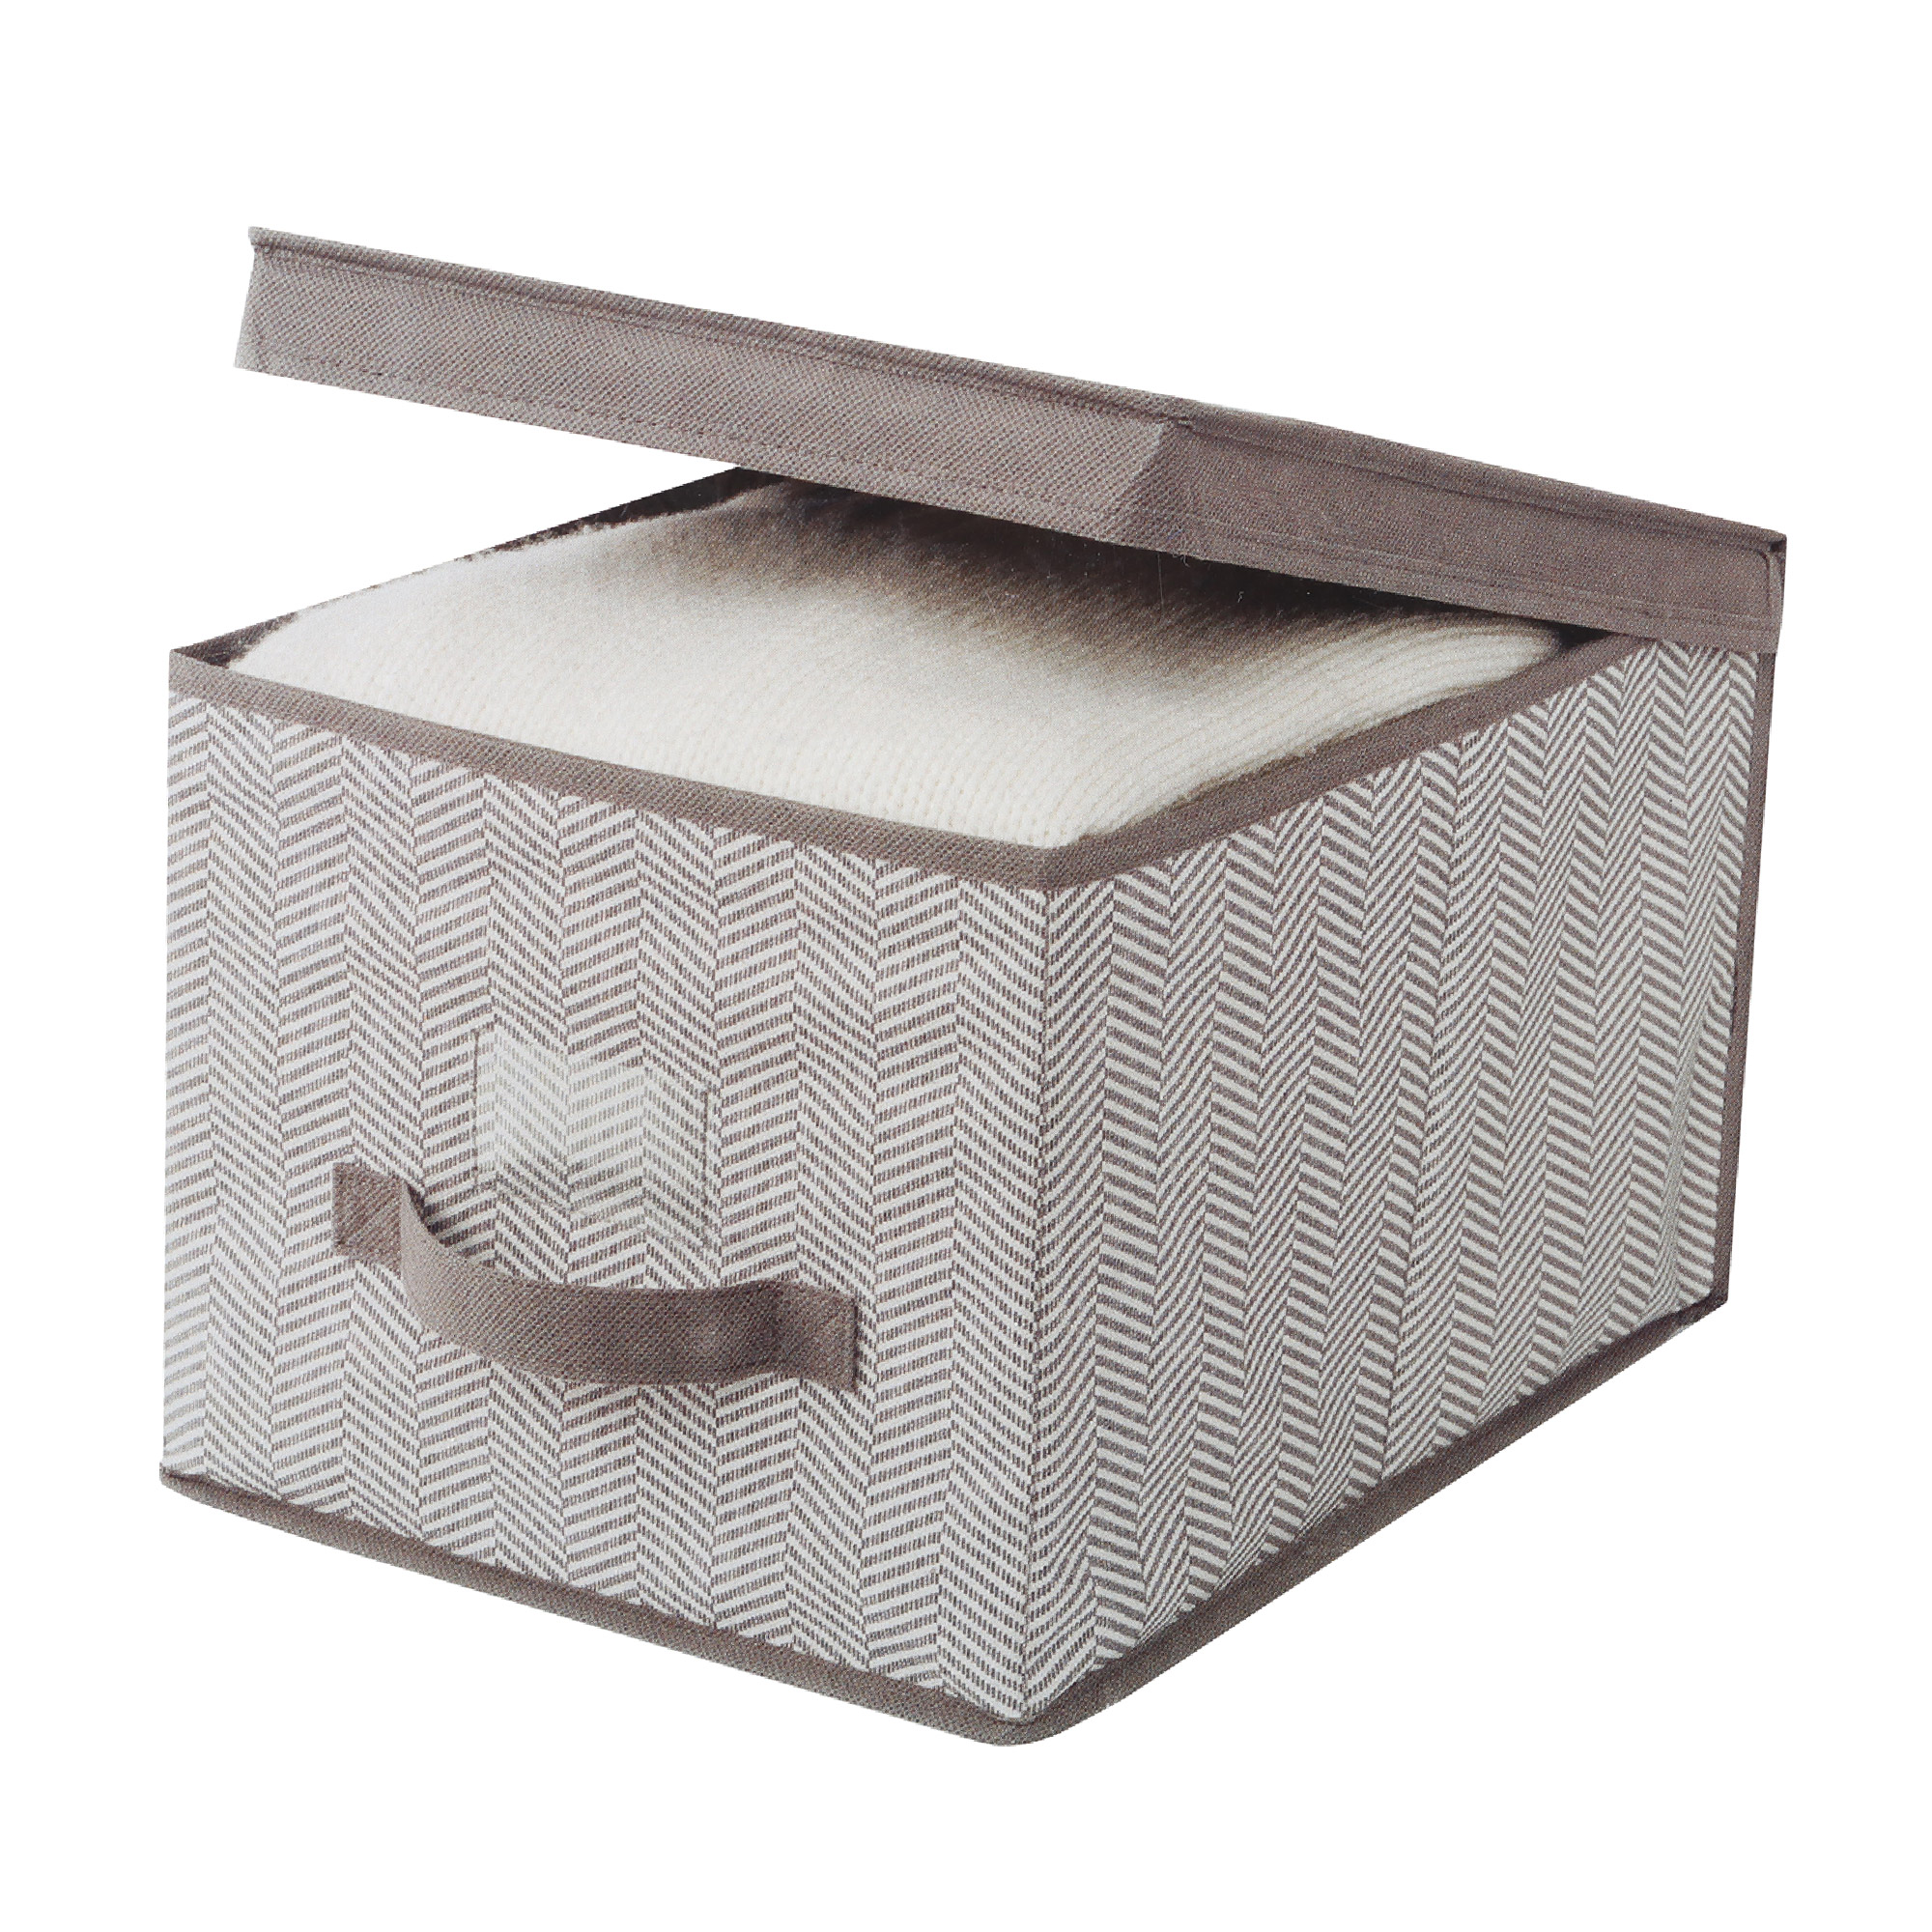 Чехол-коробка для хранения Cosatto twill mok 60x45x30